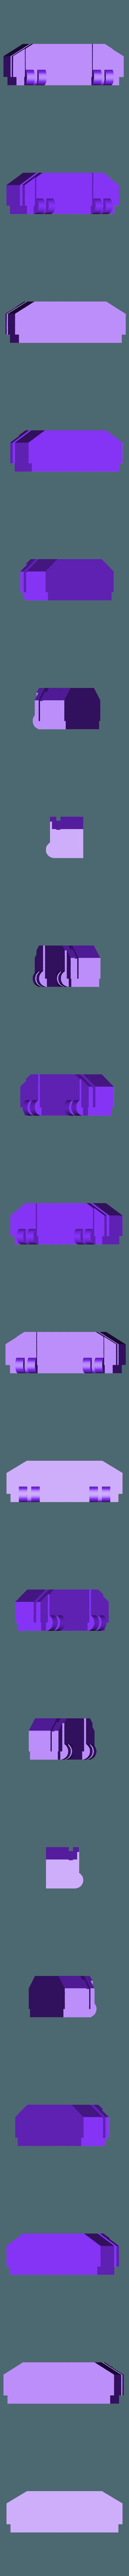 Body_Extra_Gear.stl Download free STL file Interstellar Army - Quad Mortar and Quad Cannon • 3D printing model, Cikkirock